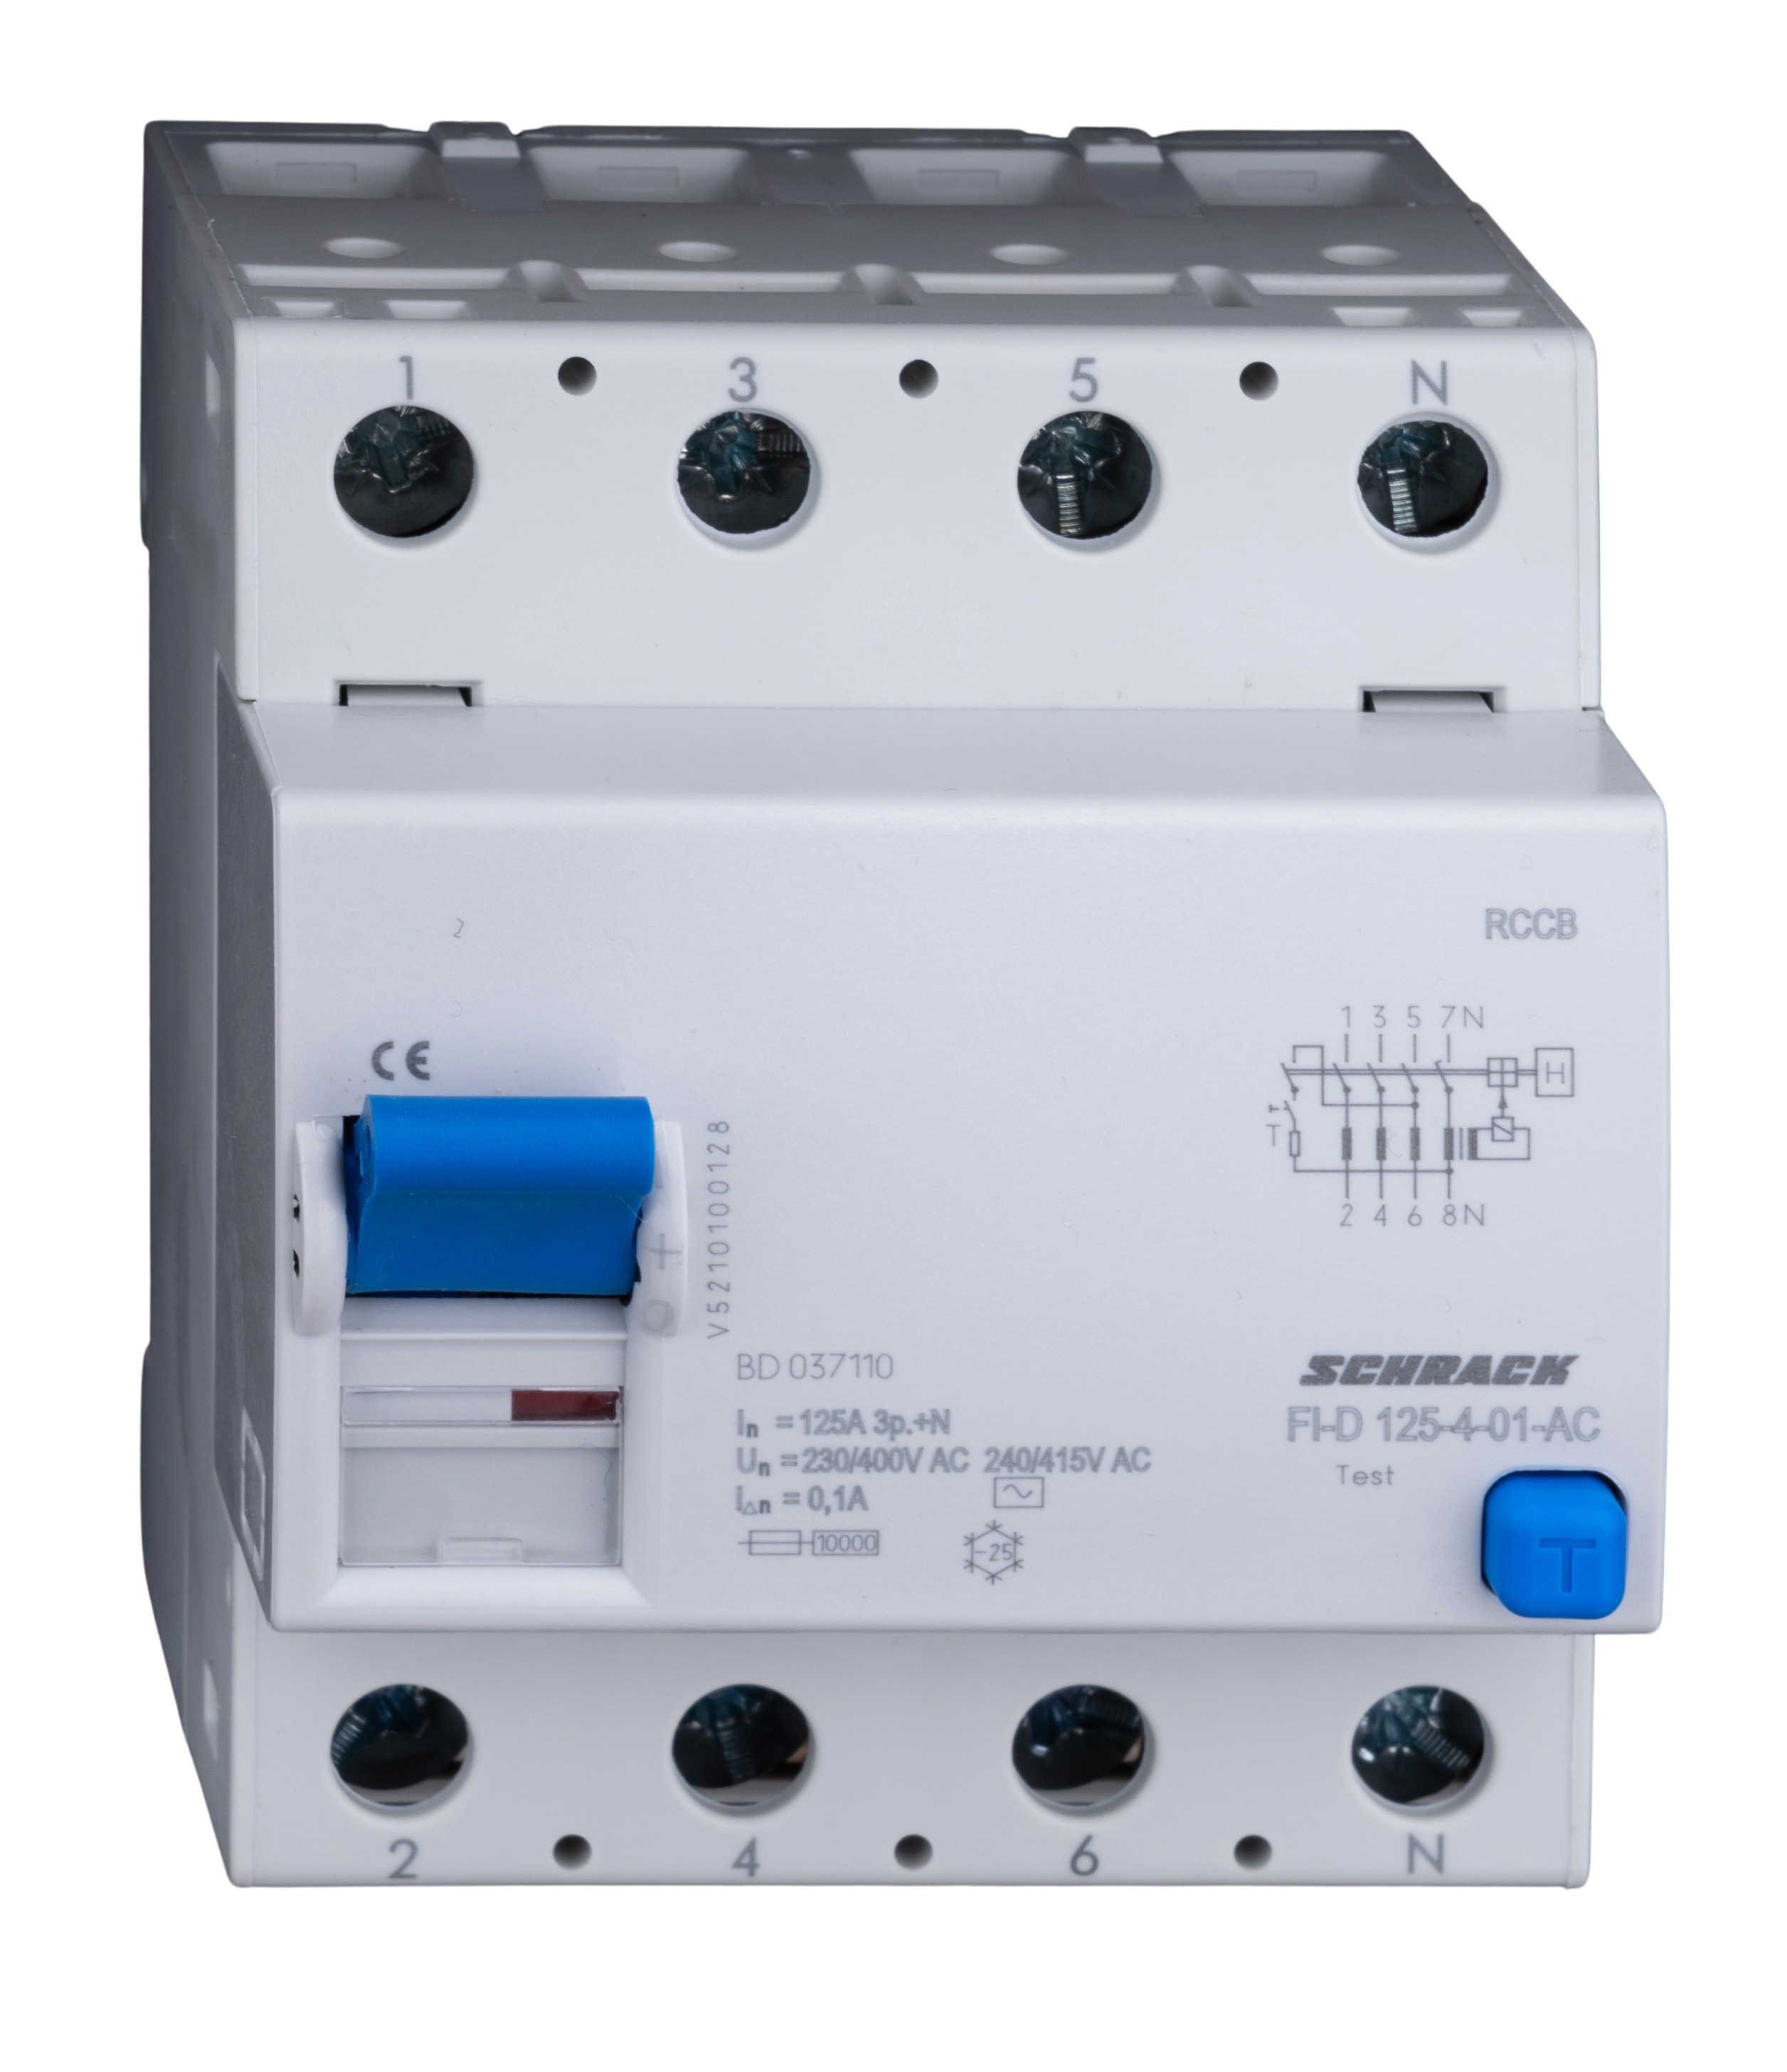 1 Stk FI-Schalter 125A, 4-polig, 100mA, Typ AC BD037110-A